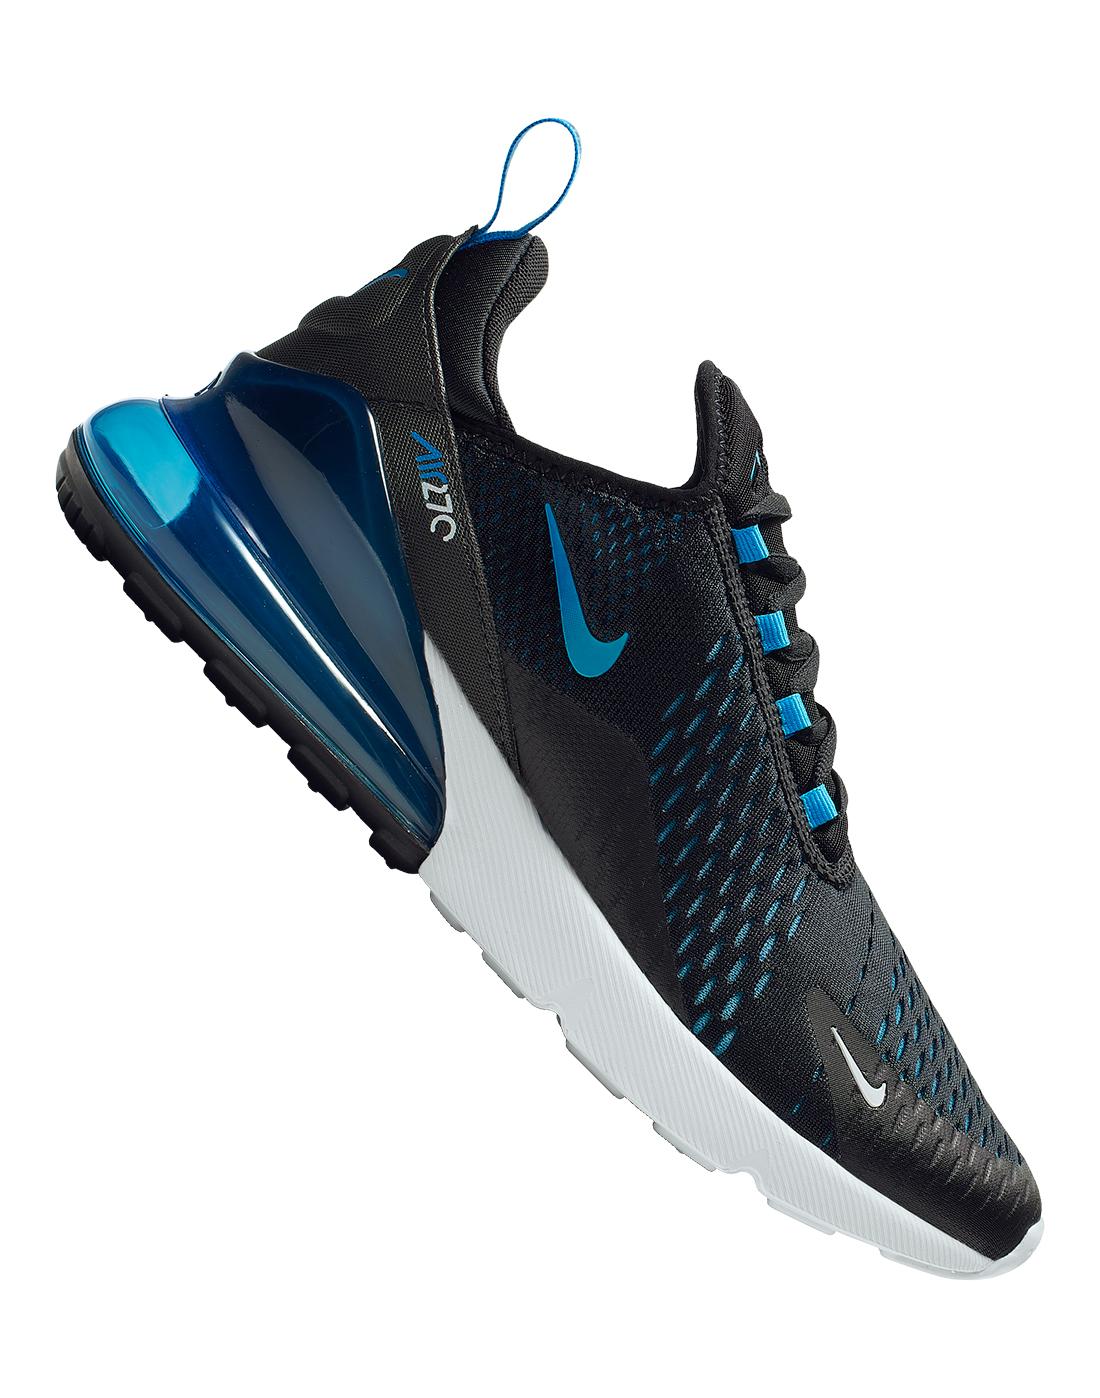 Men's Black \u0026 Blue Nike Air Max 270